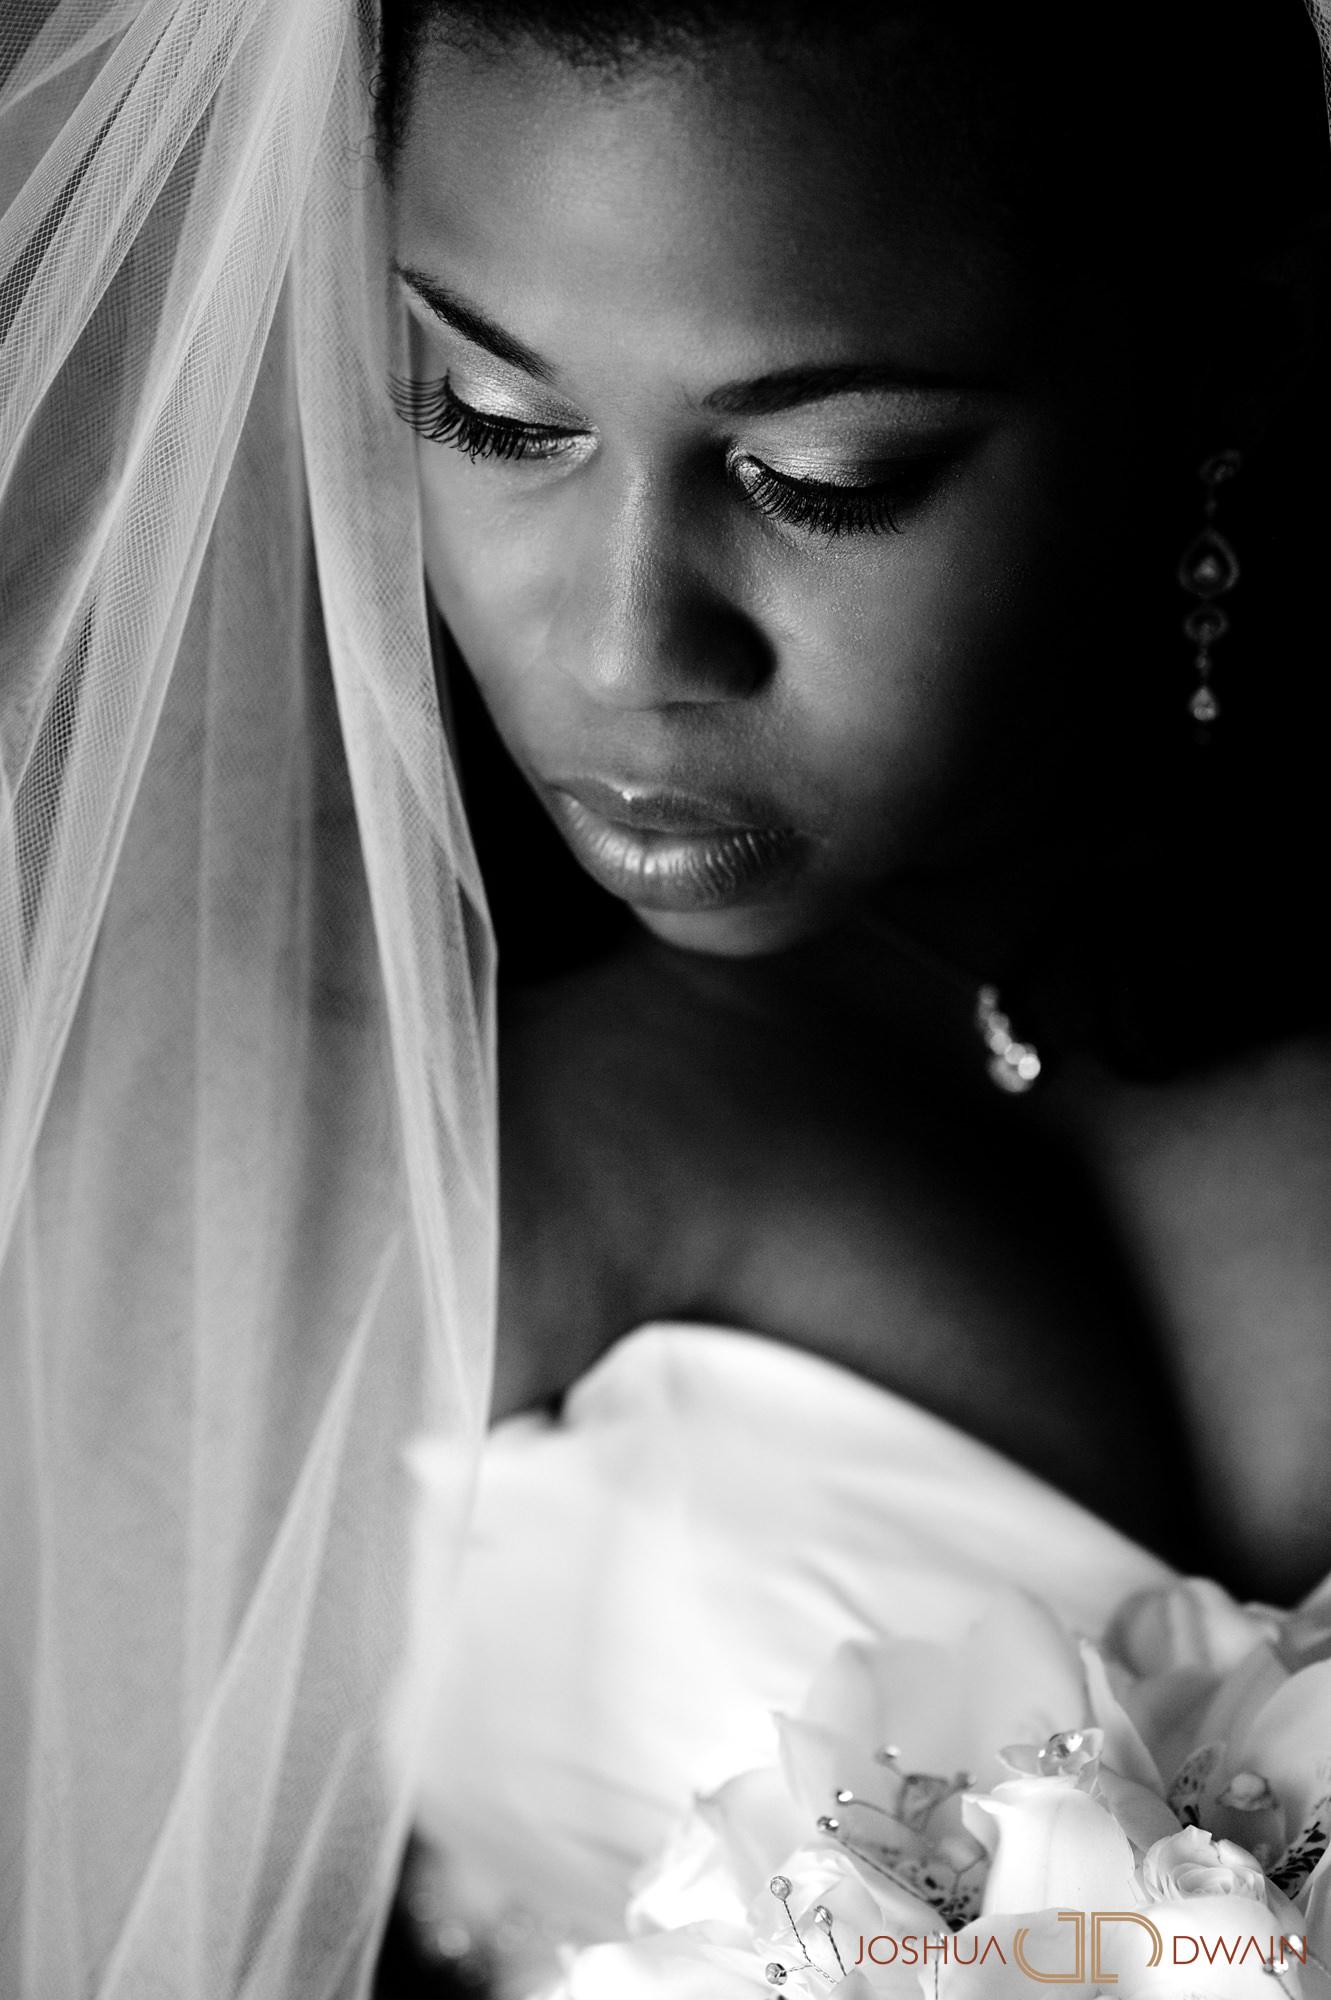 jessica-frank-007-giando-on-the-water-brooklyn-ny-wedding-photographer-joshua-dwain-2011-09-02_jf_166